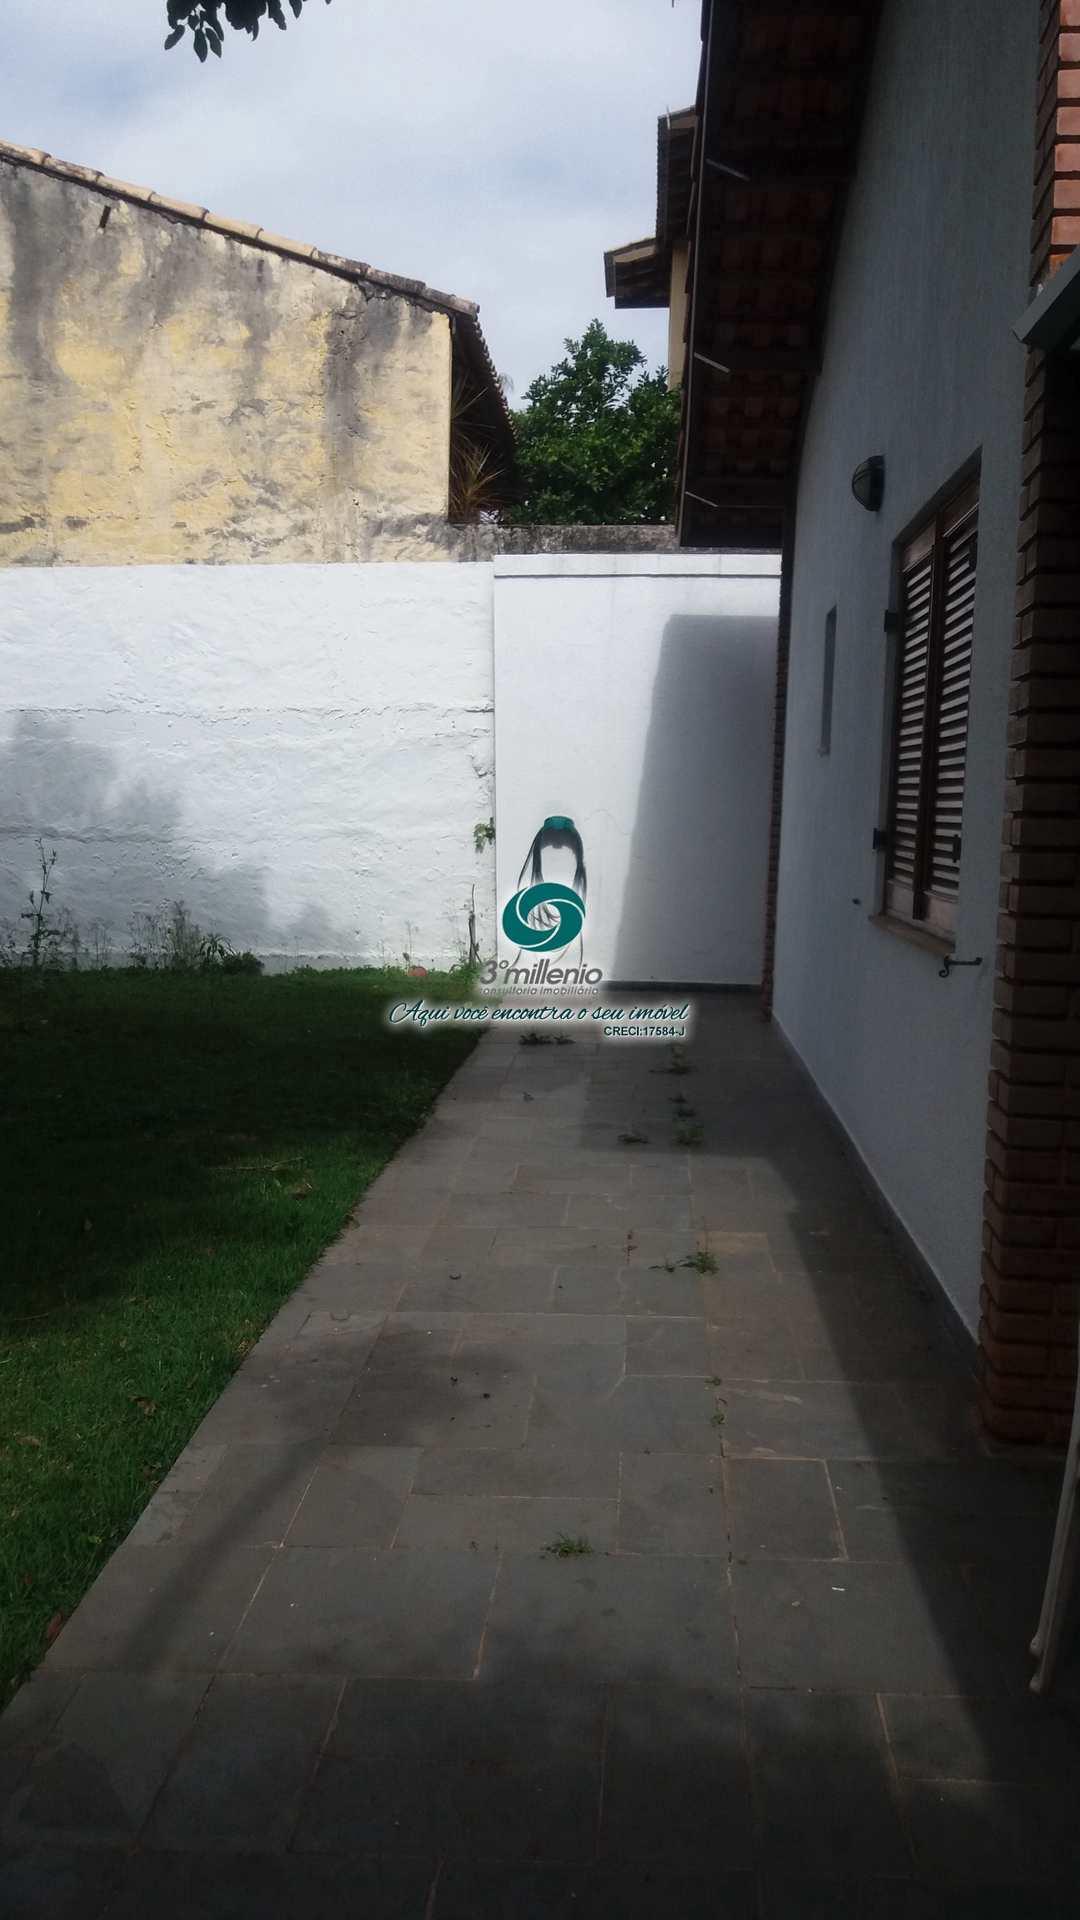 Venda Casa Térrea 3 dorms,Parque Paulistano, Granja Viana Cotia